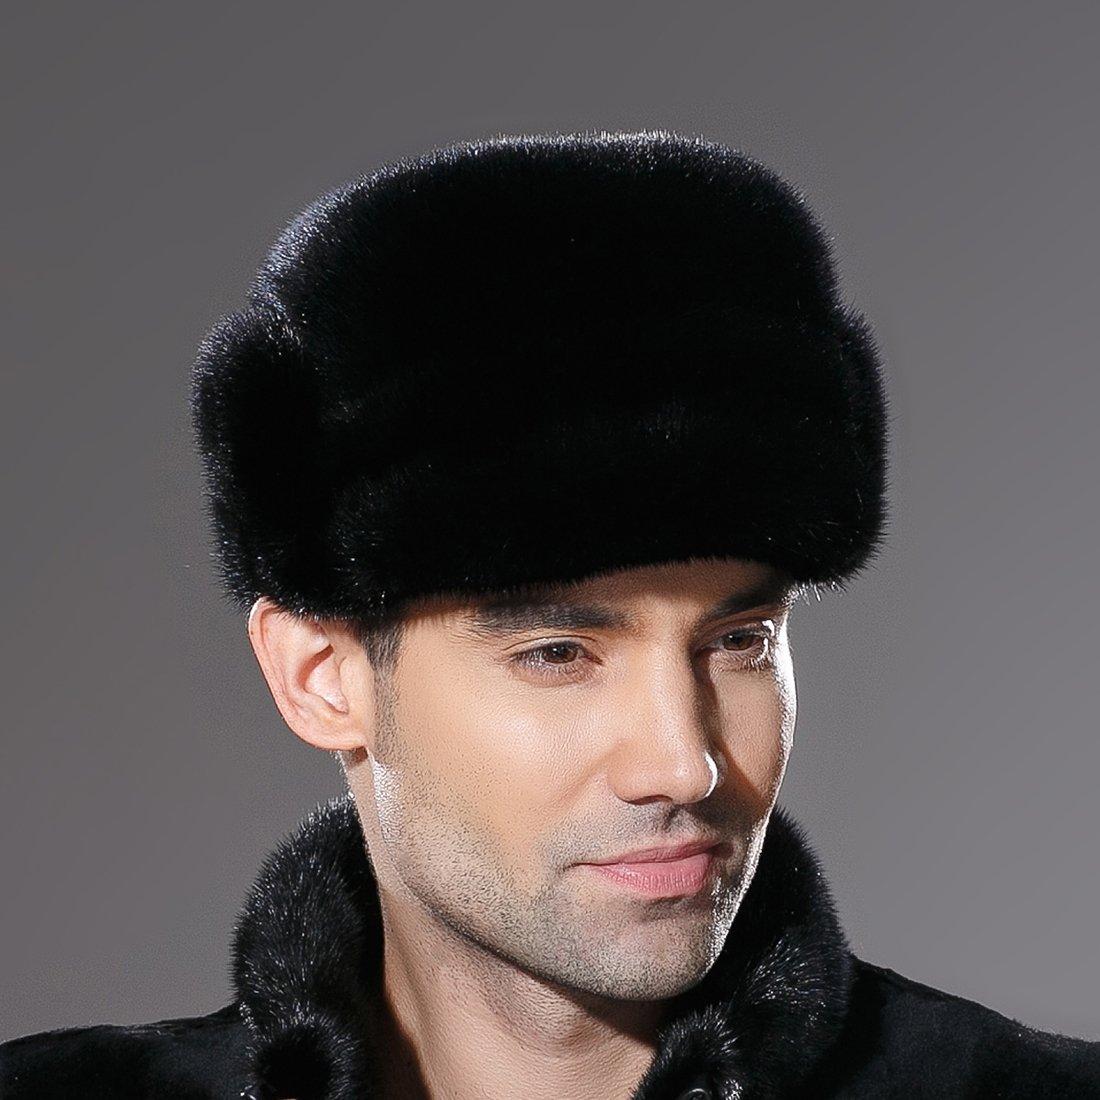 URSFUR Mne's Winter Fur Cap Genuine Mink Fur Fudd Hat Black M by URSFUR (Image #3)